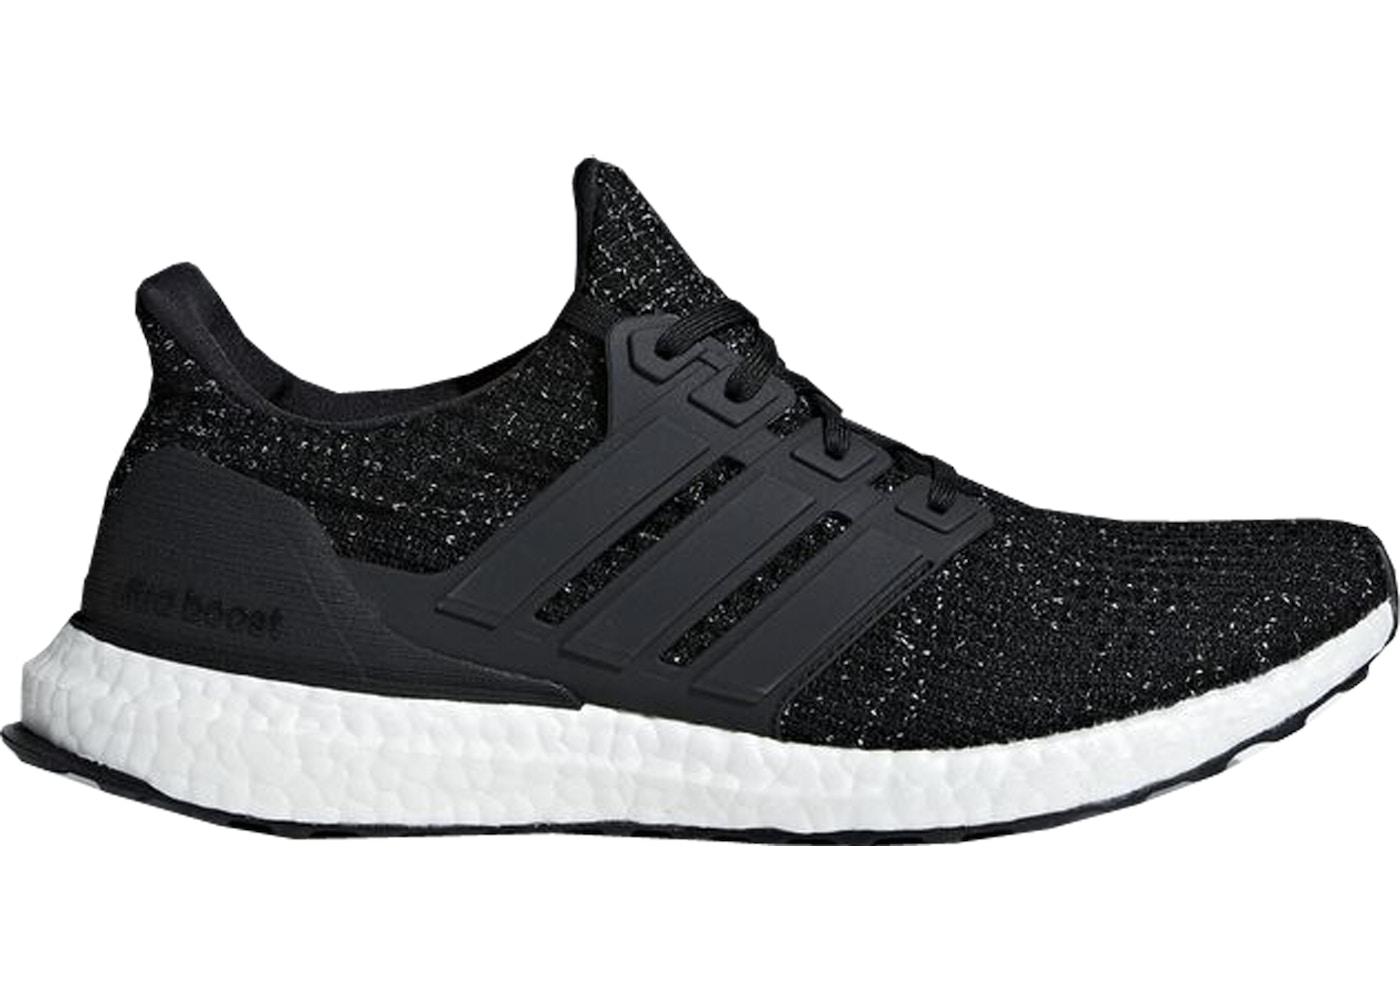 adidas Ultra Boost 4.0 Black White Speckle - F36153 7b34f51ba